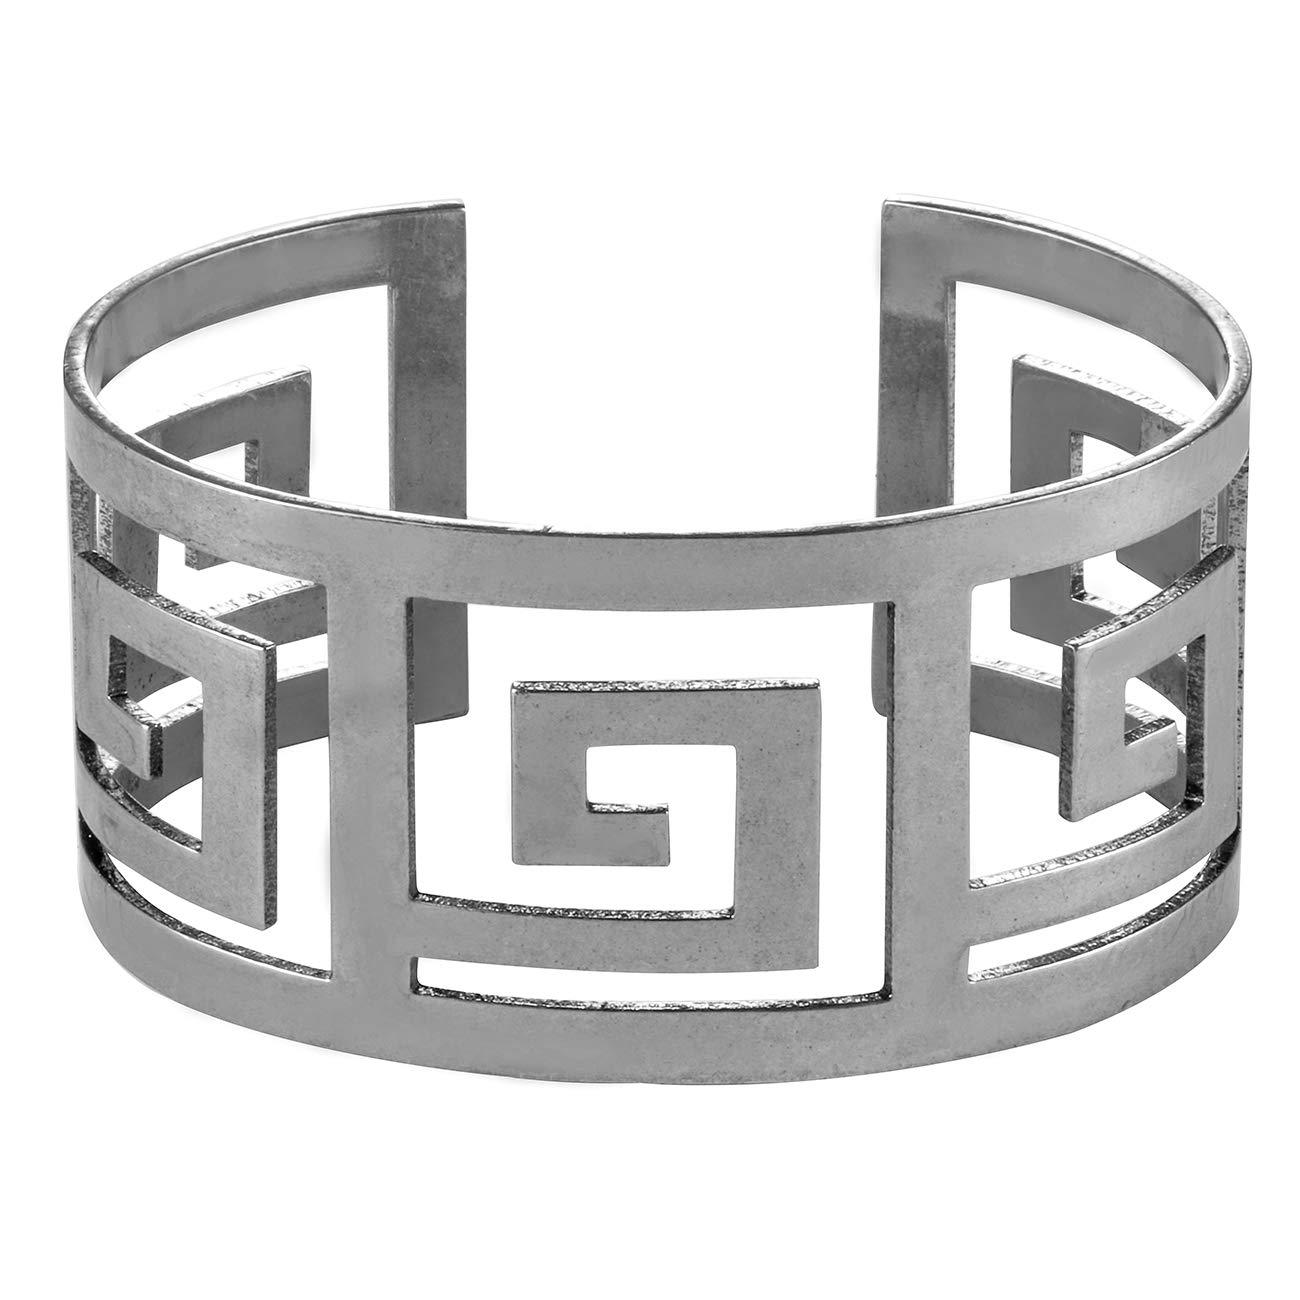 8Mm 3 Row Glitter Lightz Bangle DiamondJewelryNY Bangle Bracelet